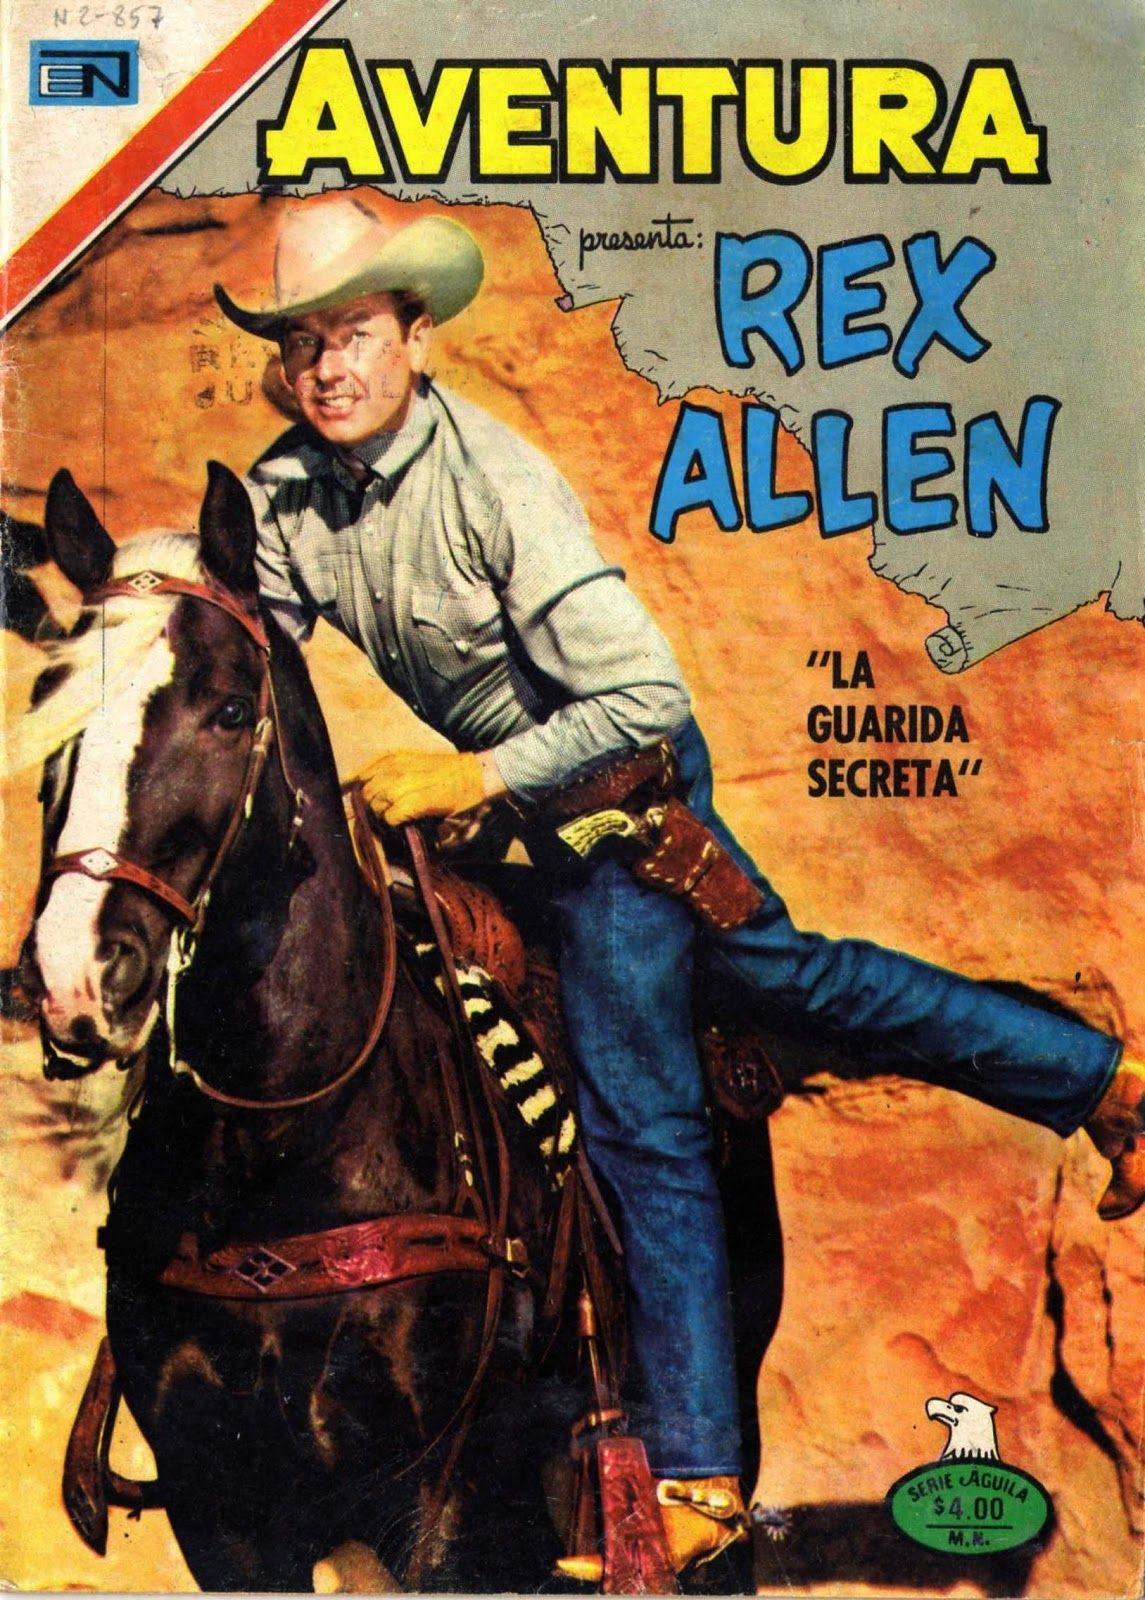 Rex Allen   gurigibi 2014: AVENTURA FAROESTE Nº857 1978 REX ALLEN